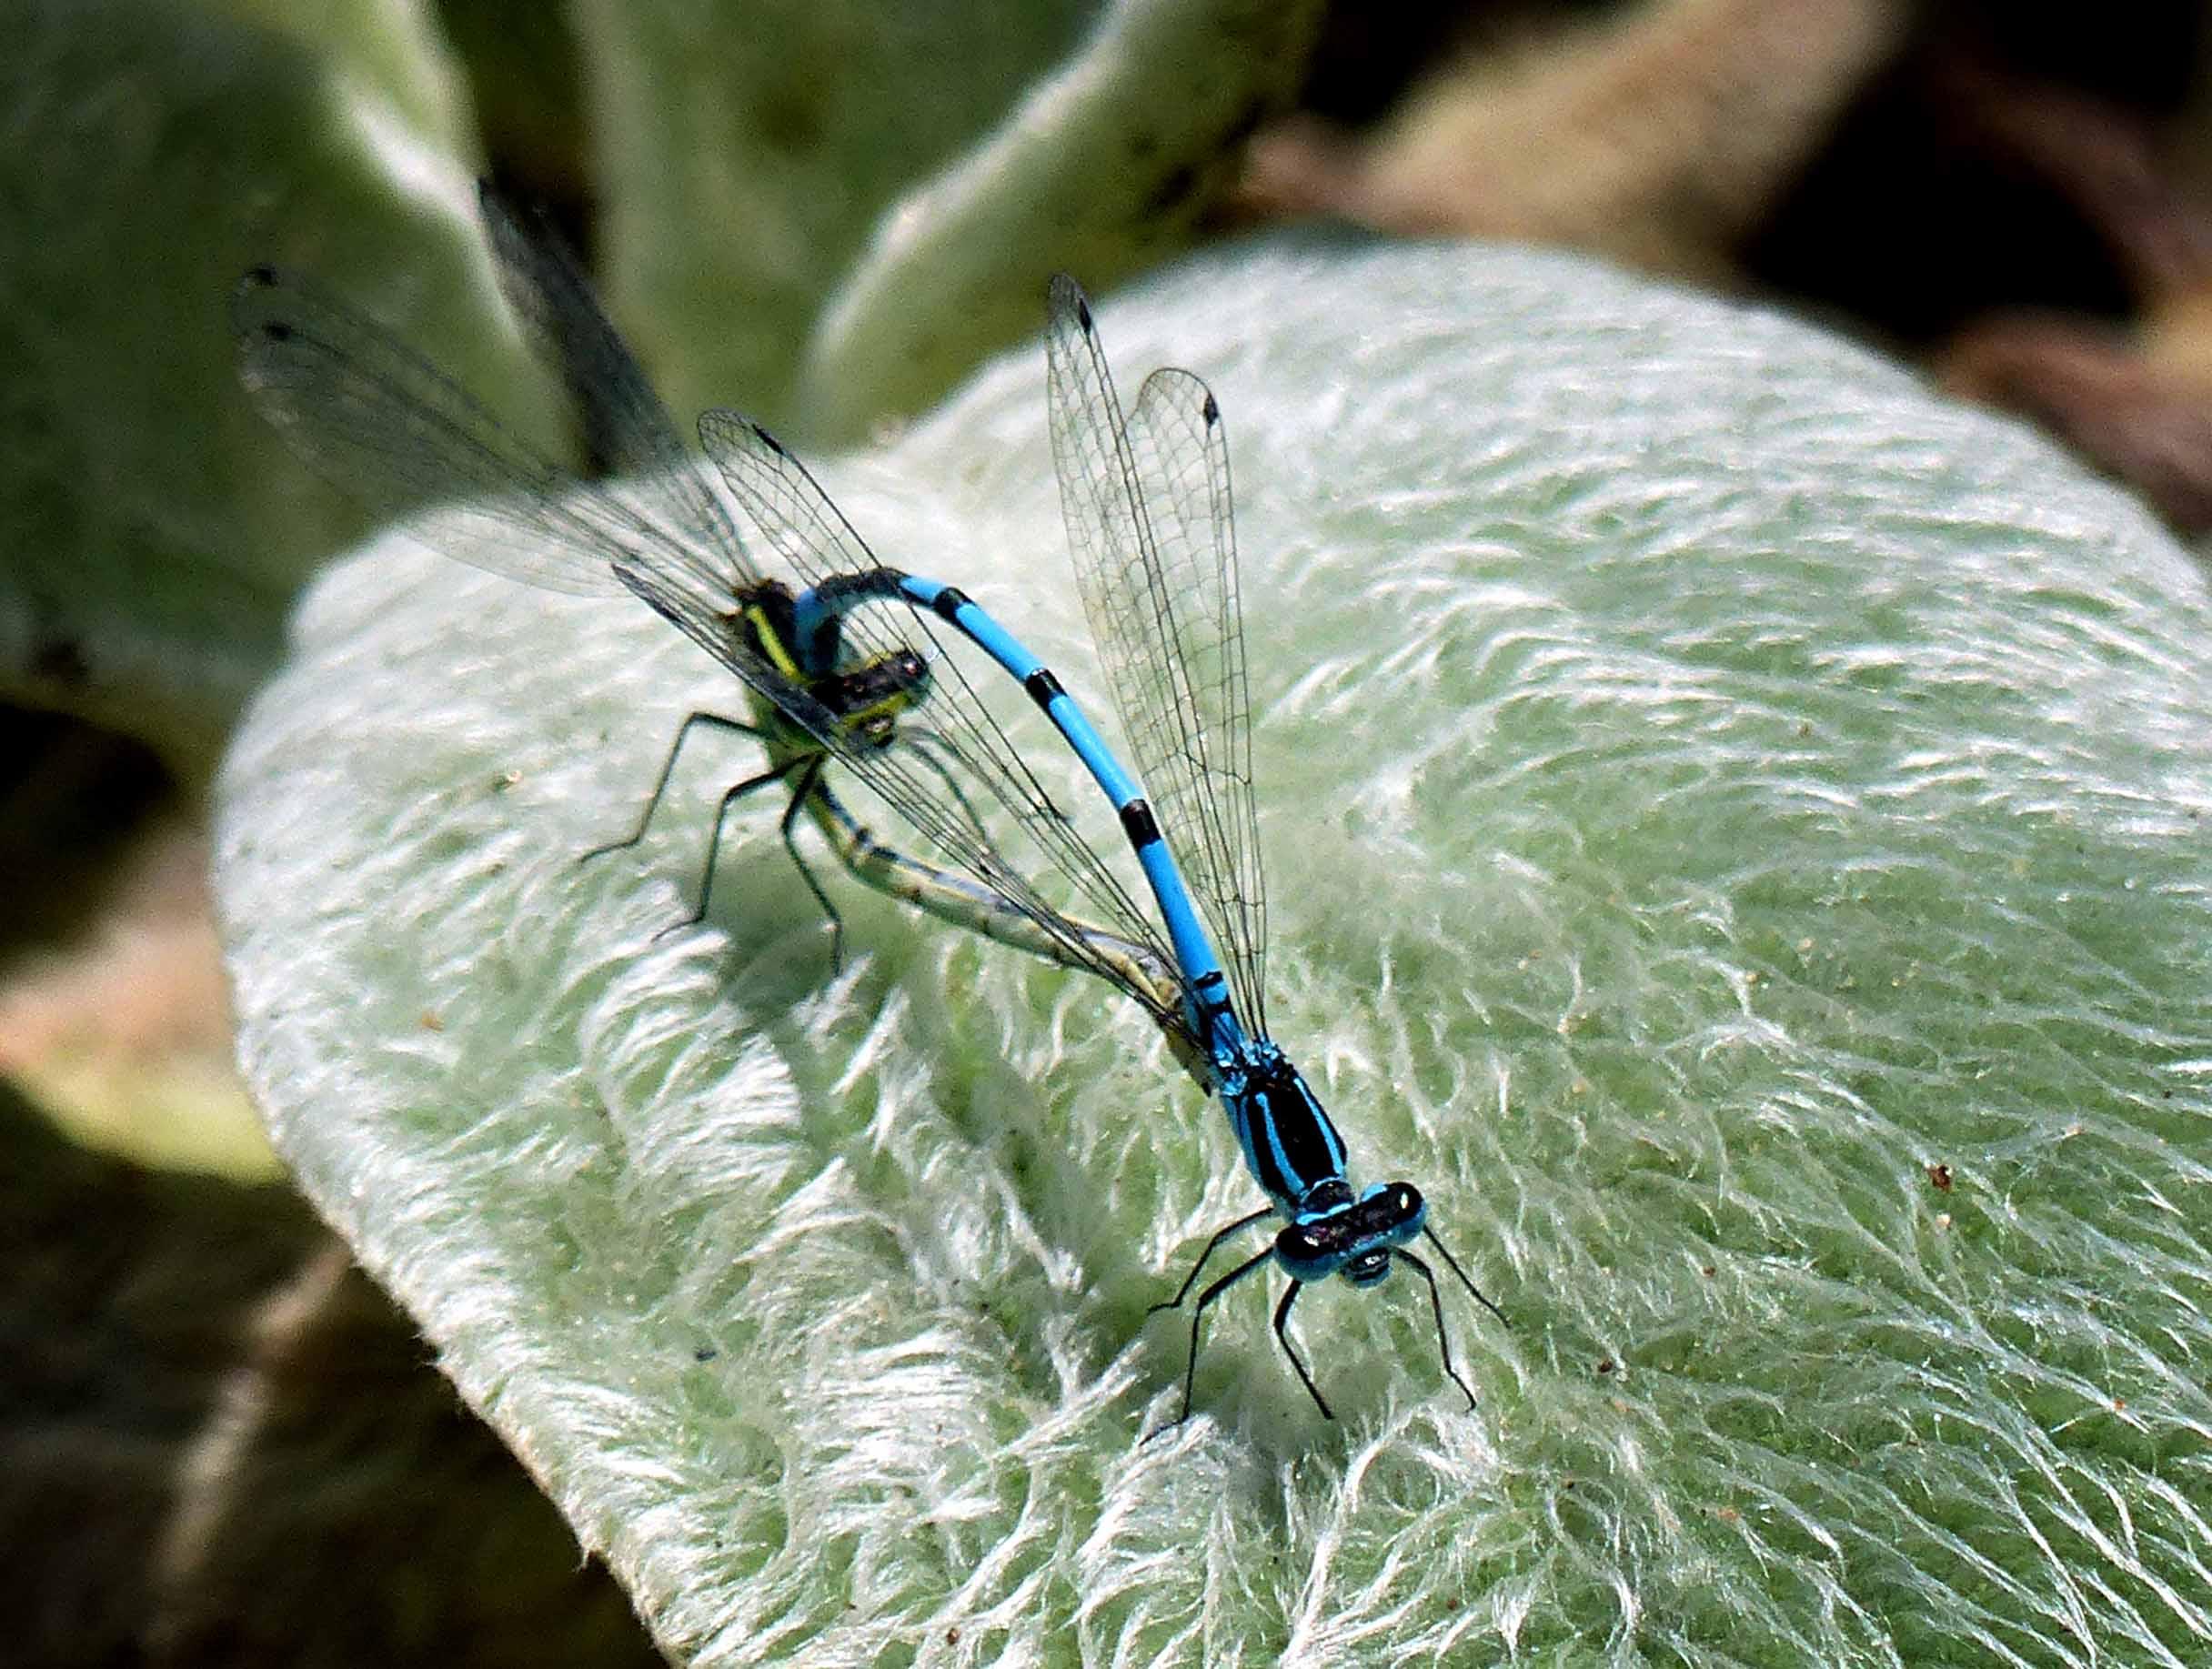 Blue damselflies mating on a hairy leaf